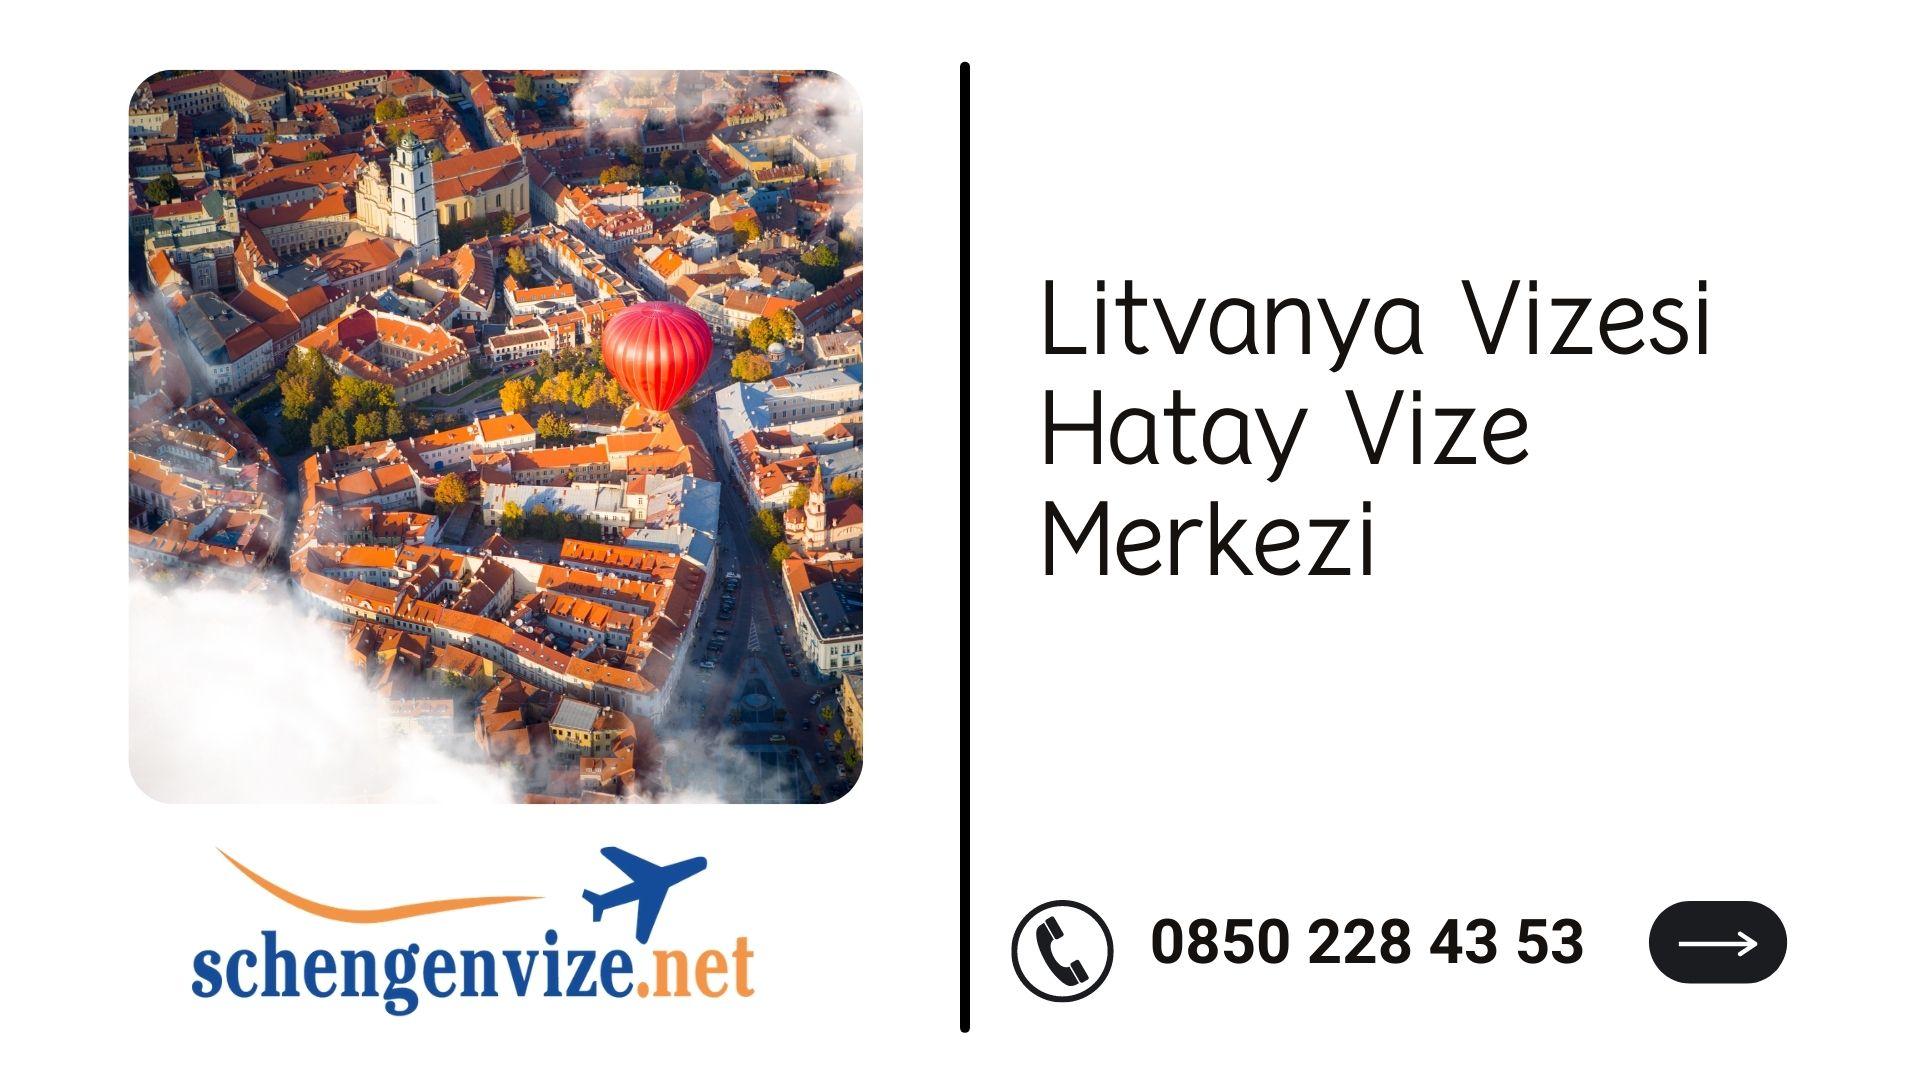 Litvanya Vizesi Hatay Vize Merkezi